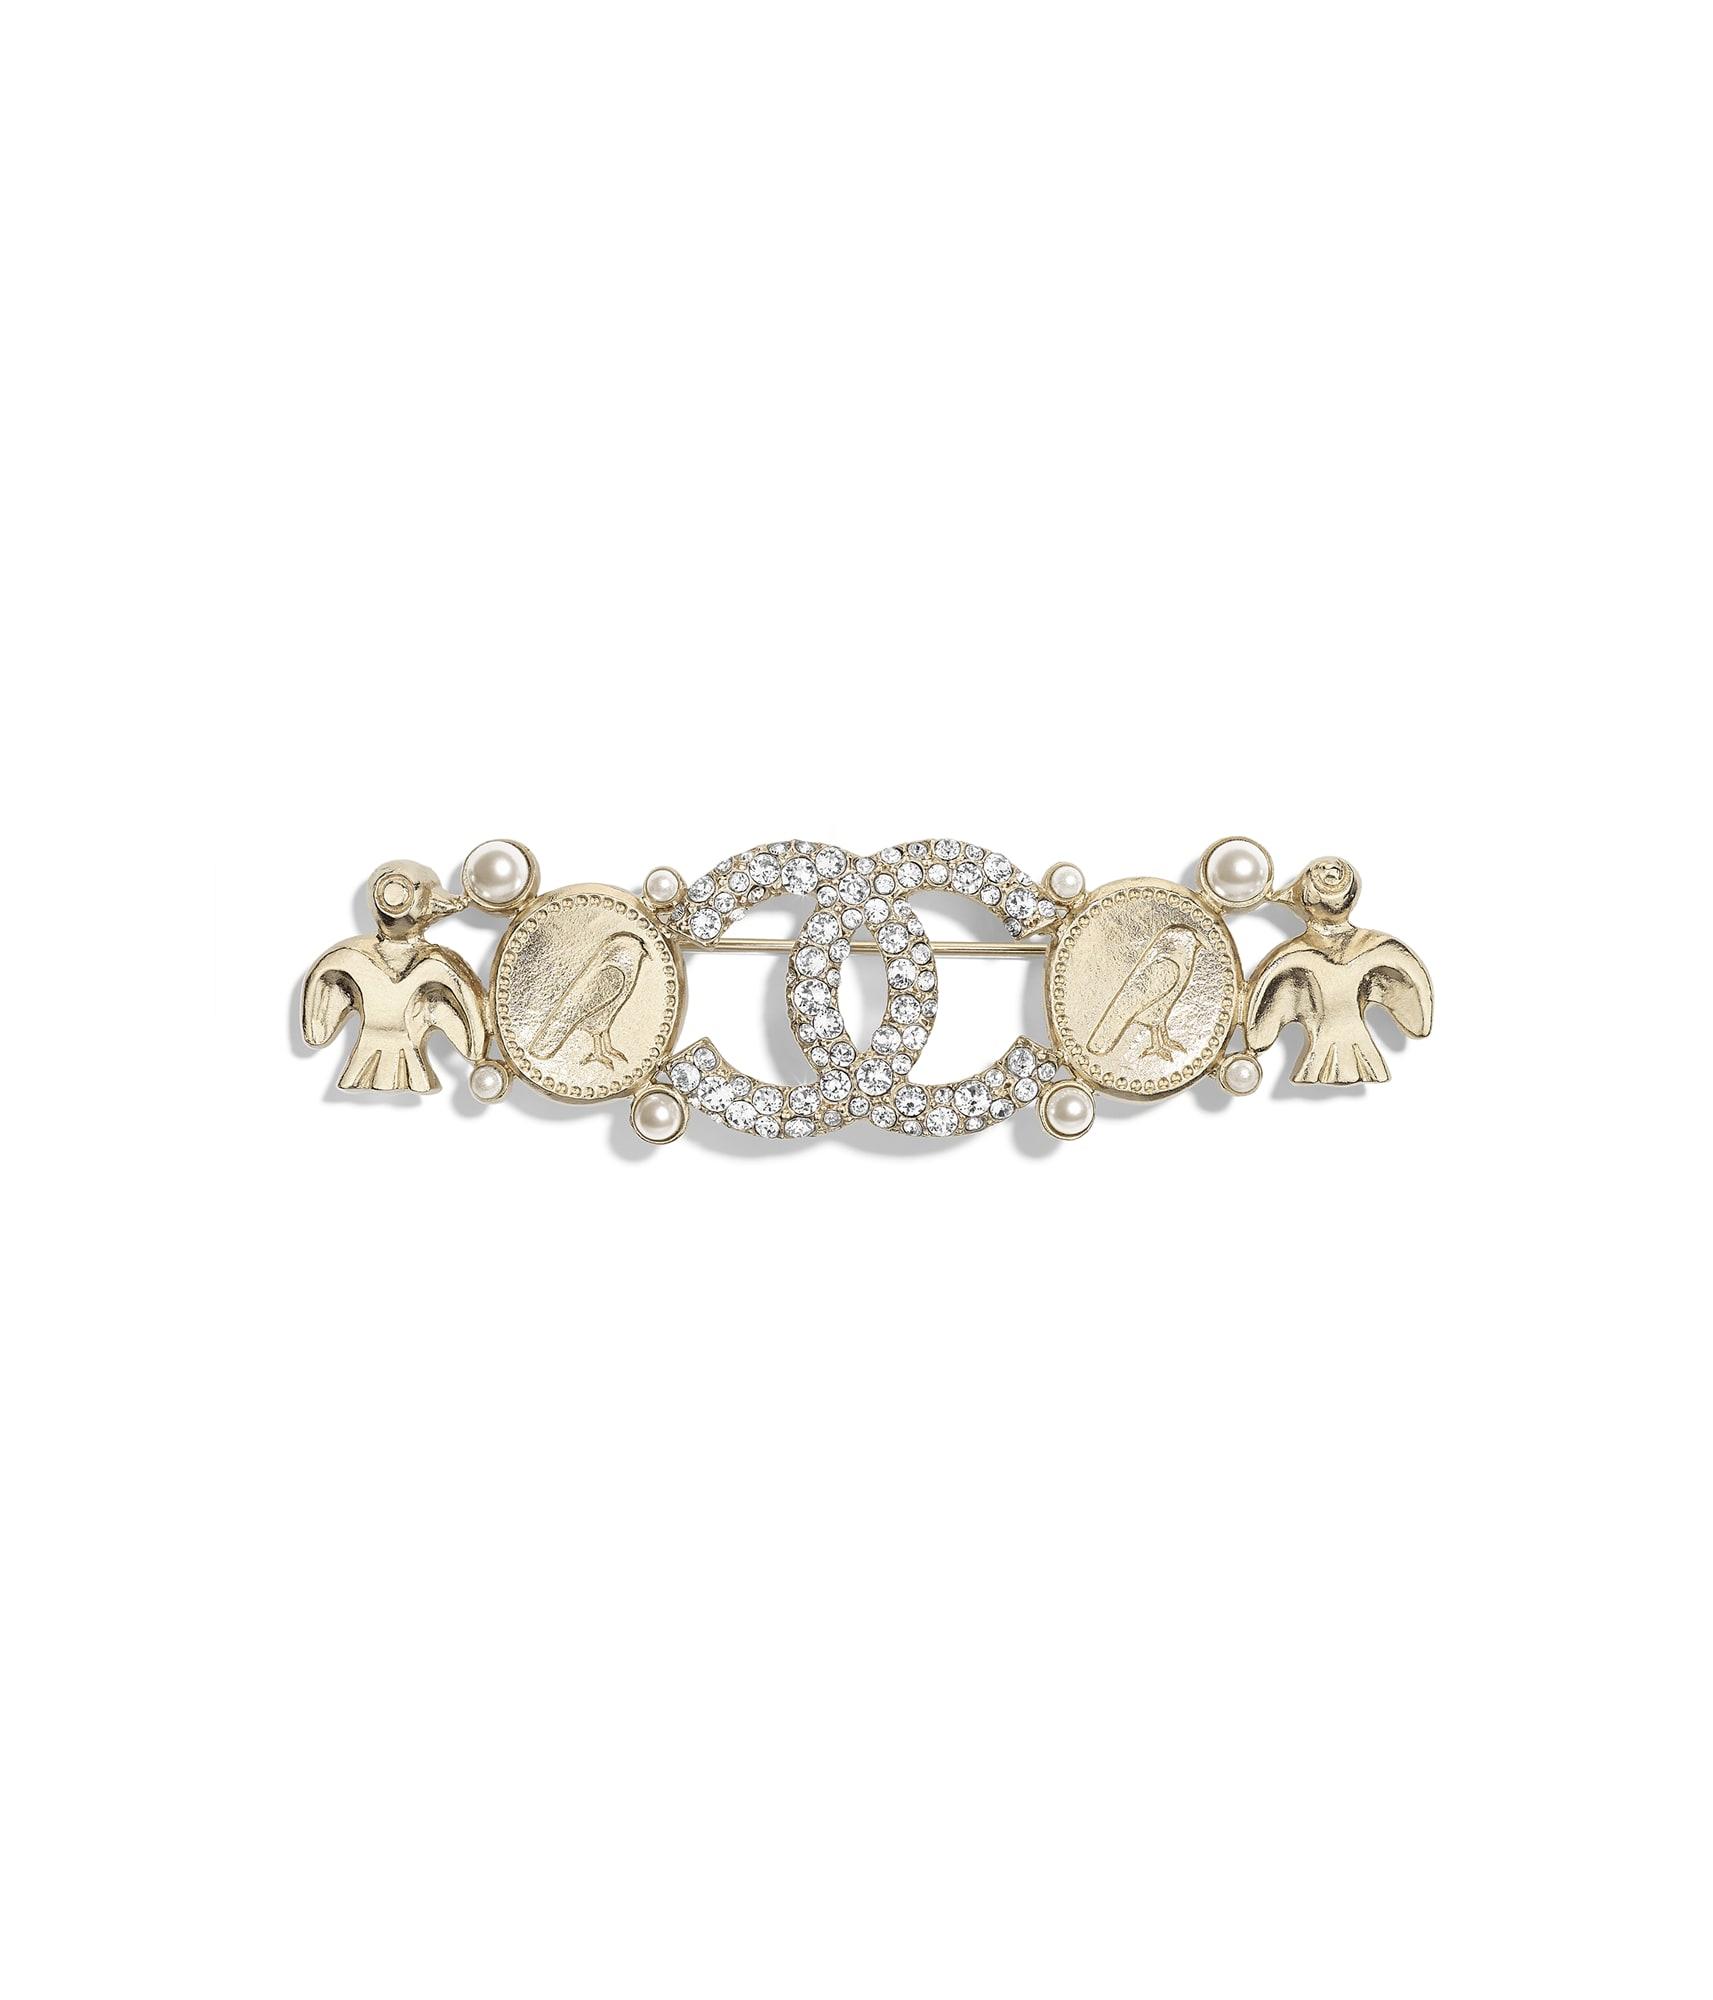 Costume Jewellery But Very Pretty Silver Brooch Jewellery & Watches Costume Jewellery